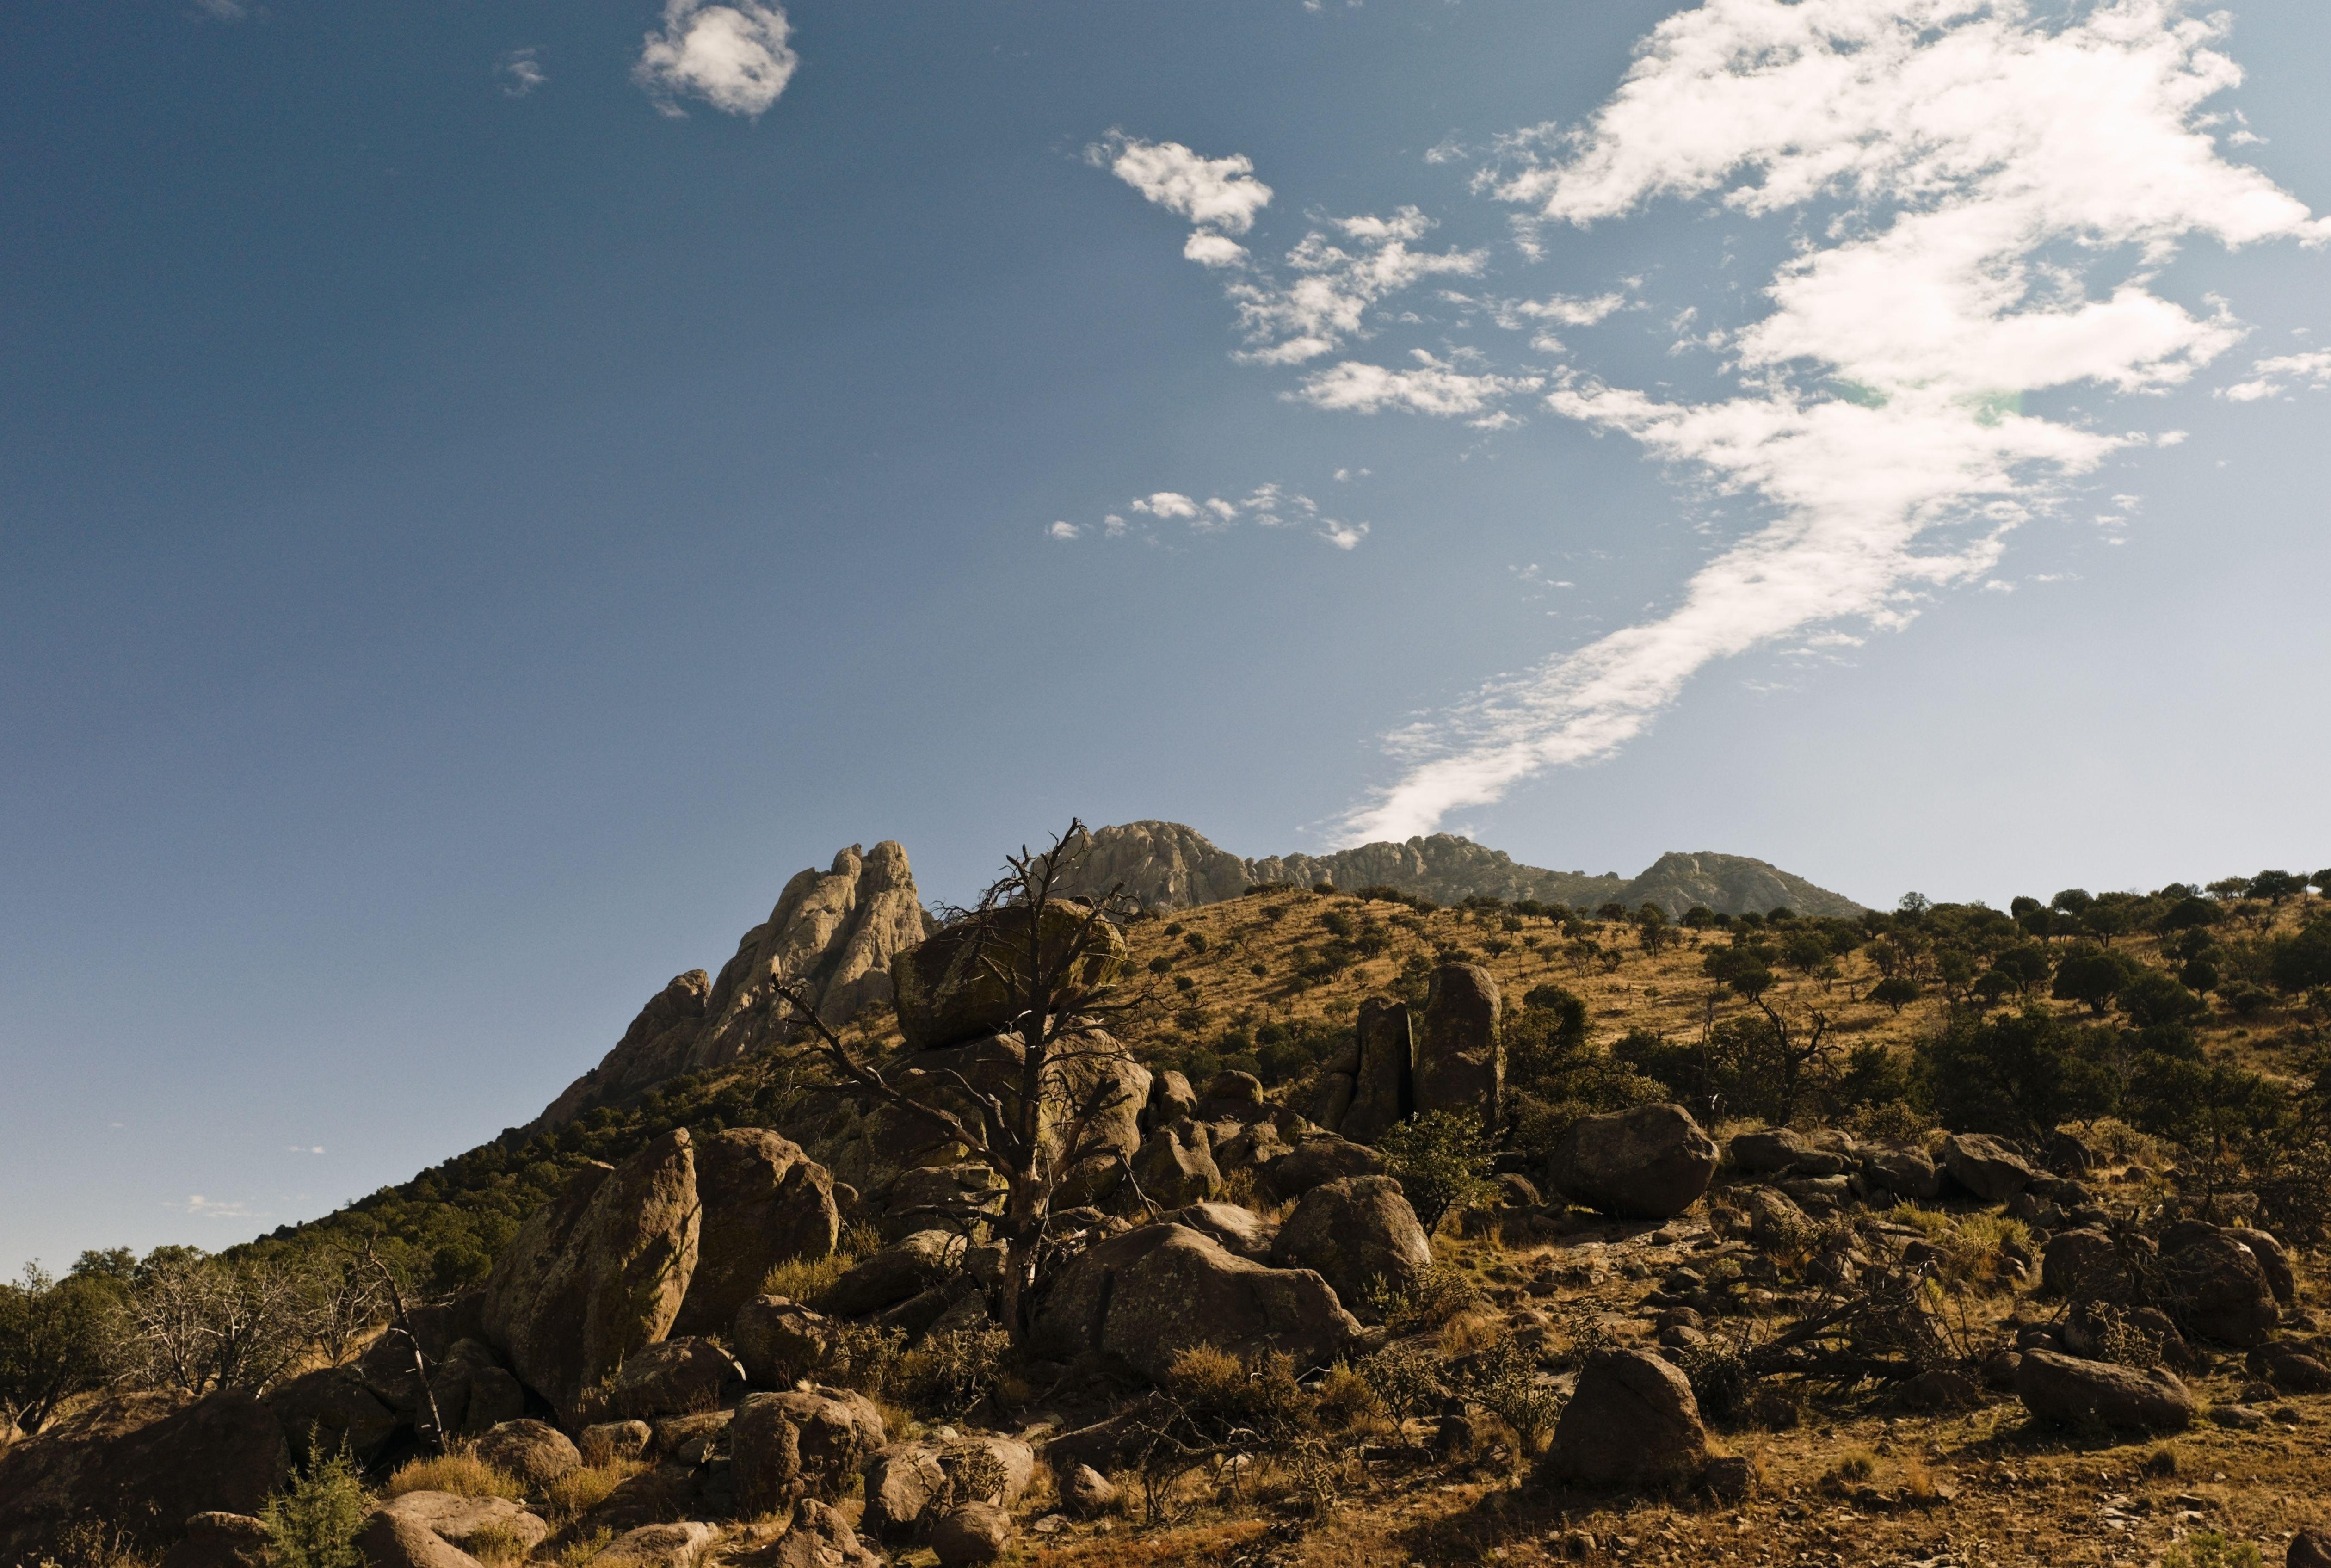 USA, Texas, Davis Mountains, low angle view